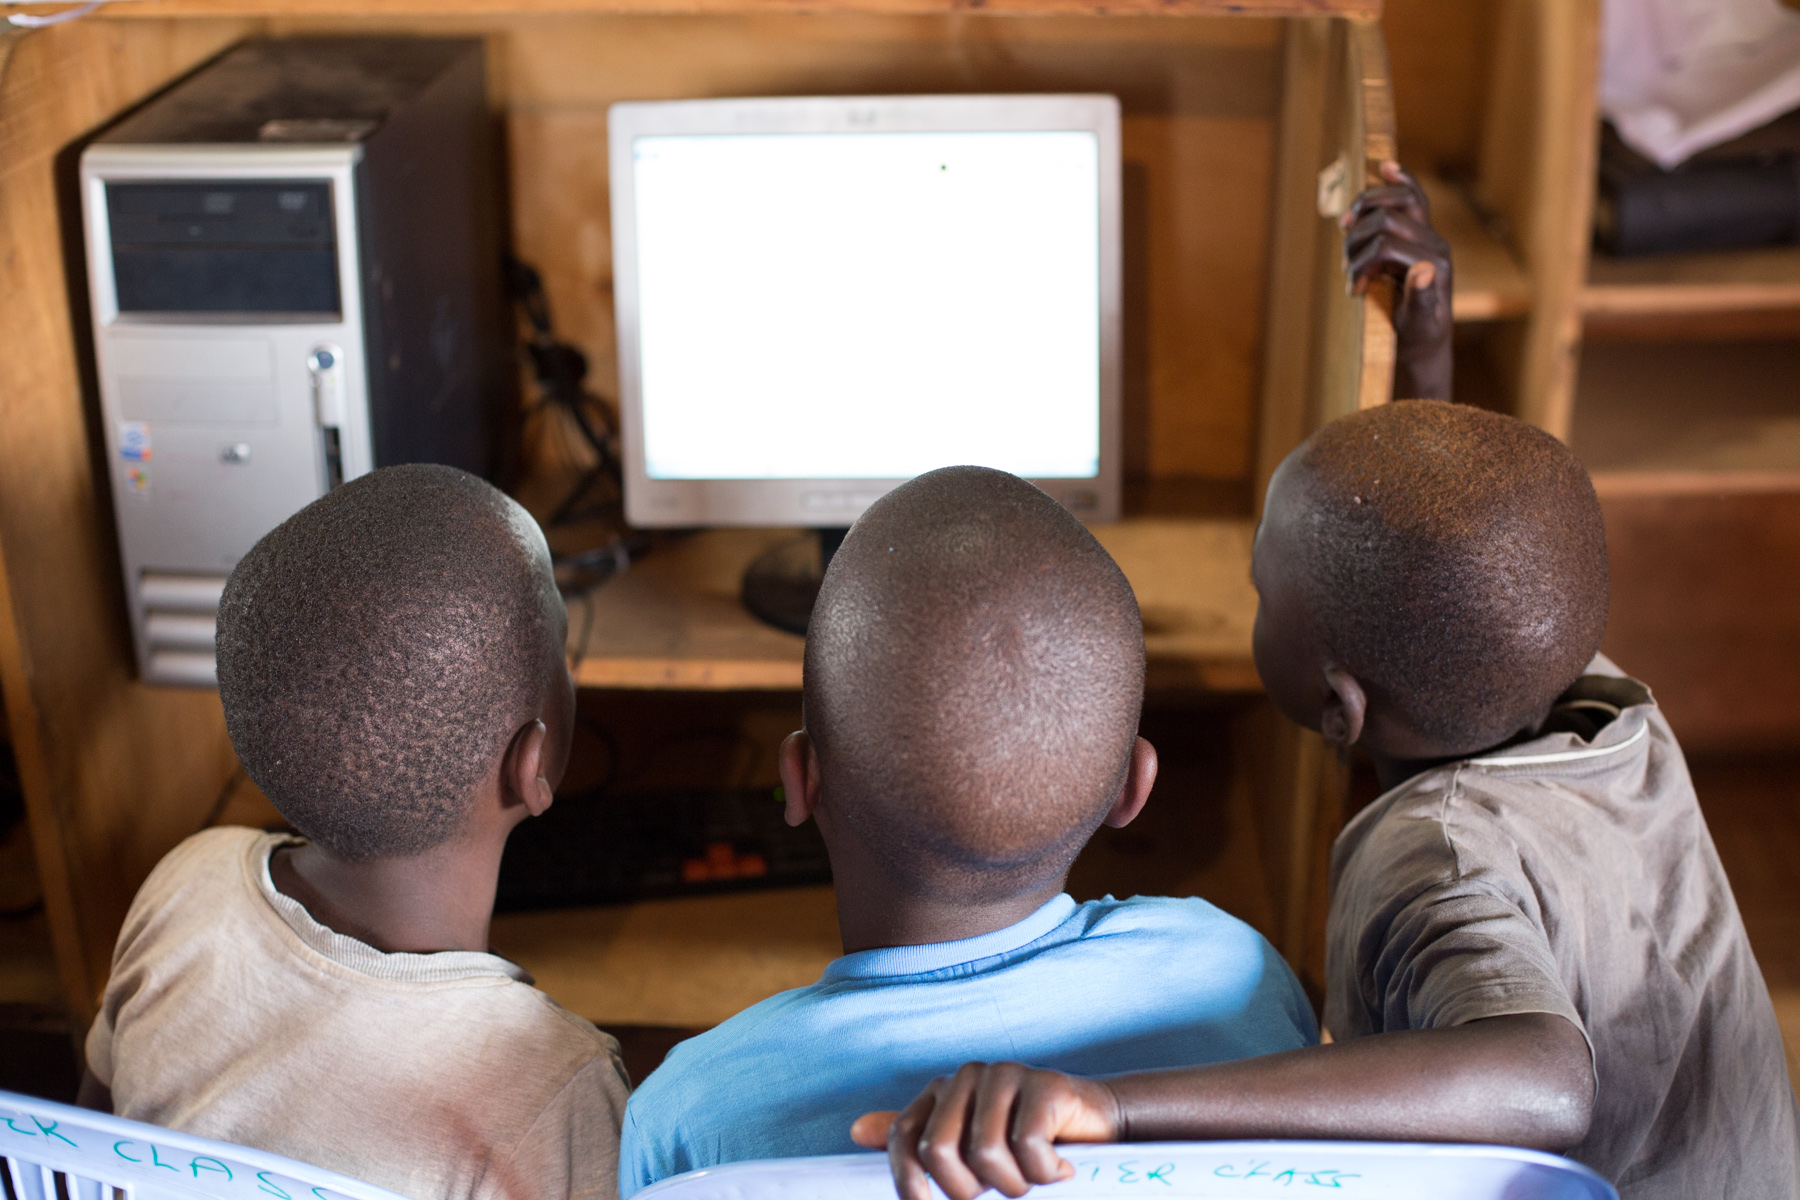 Computer class at the SHOFCO community center.  Kibera, Nairobi, Kenya